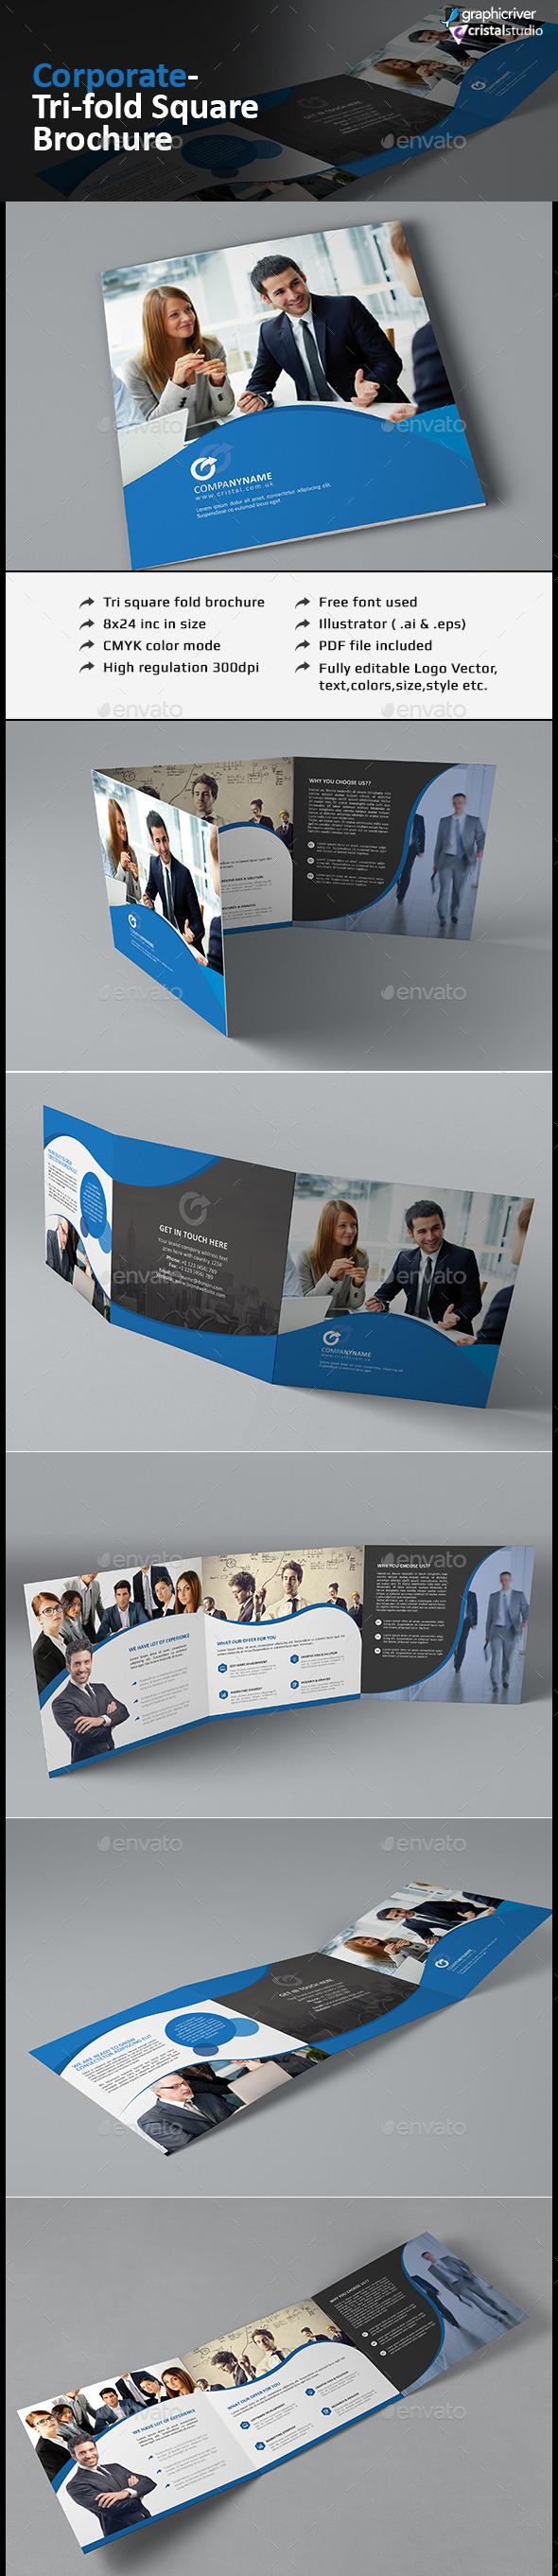 Tri-fold Square Brochure - Corporate Brochures